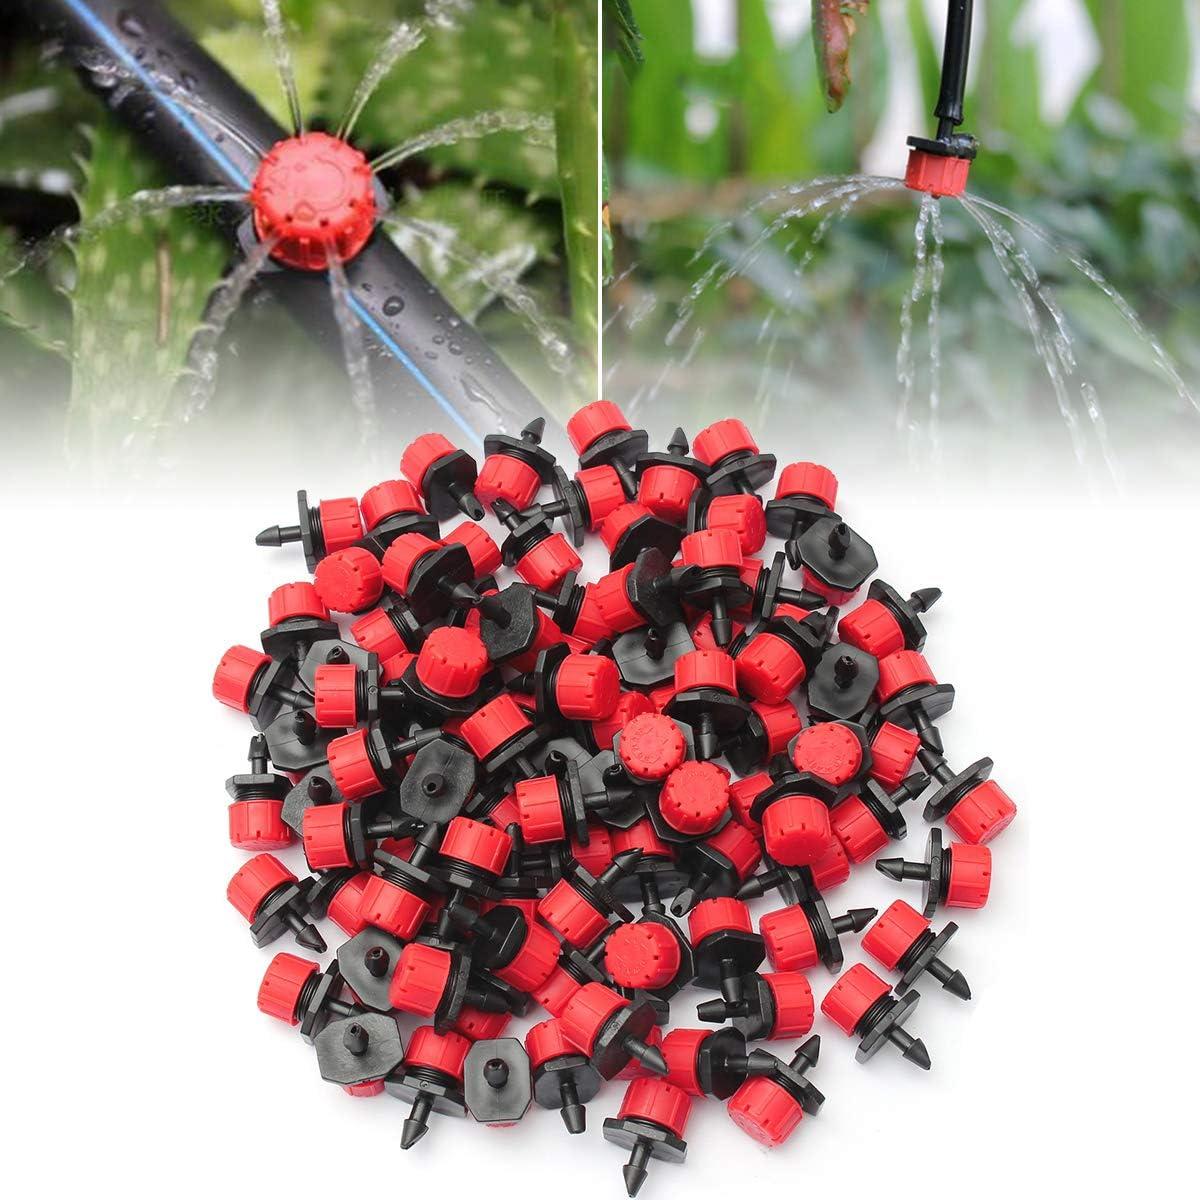 OUTERDO Goteros de riego y aspersores con lengüeta ajustable de 360 ° para macizos de flores, huertos, césped (110 piezas)